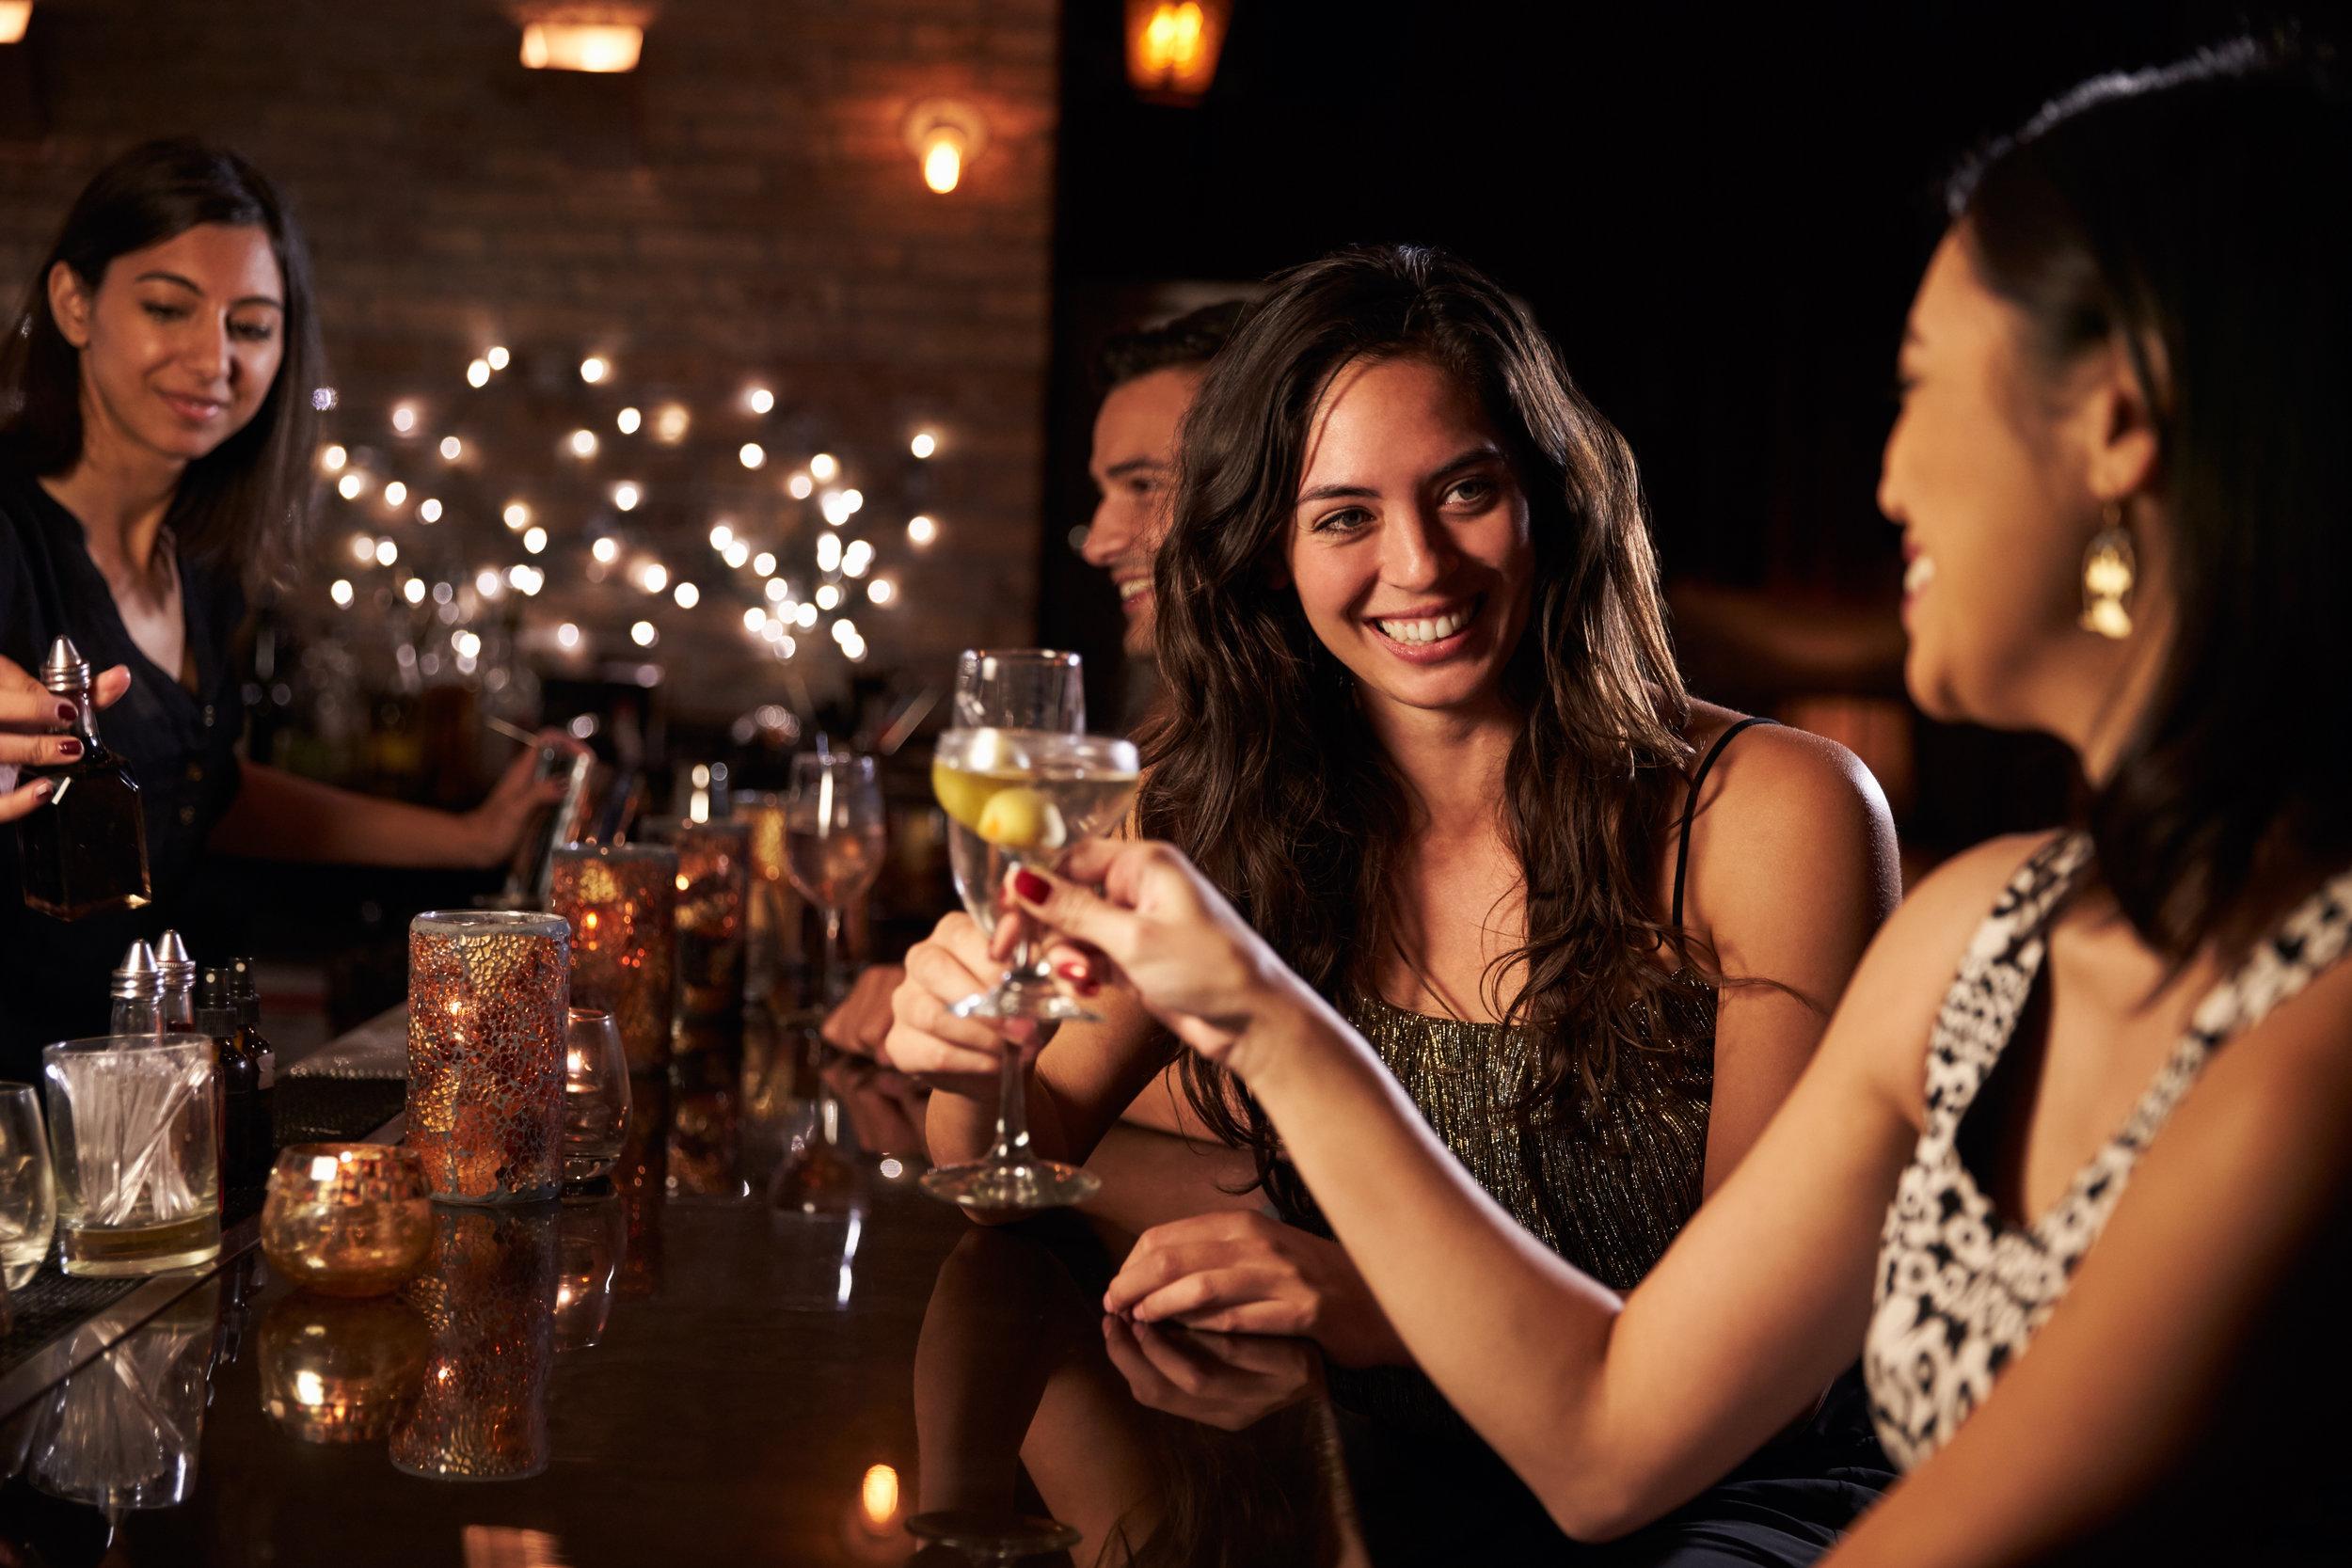 Friends sitting at a bar